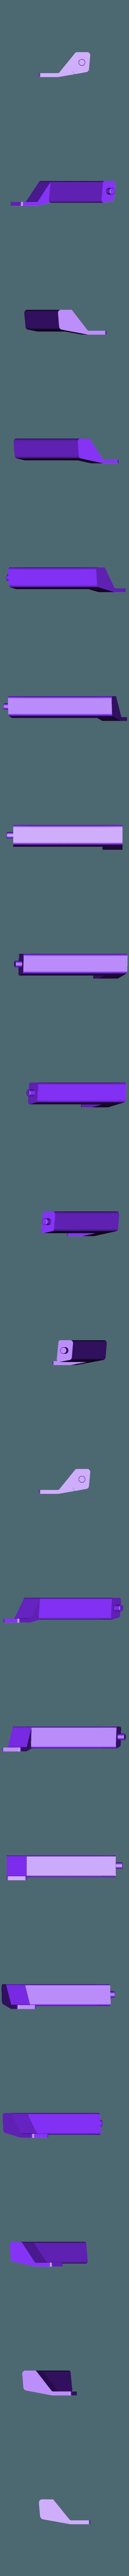 GorenjeP2fridge_mcko.stl Download STL file Gorenje fridge handle • 3D printable model, mcko